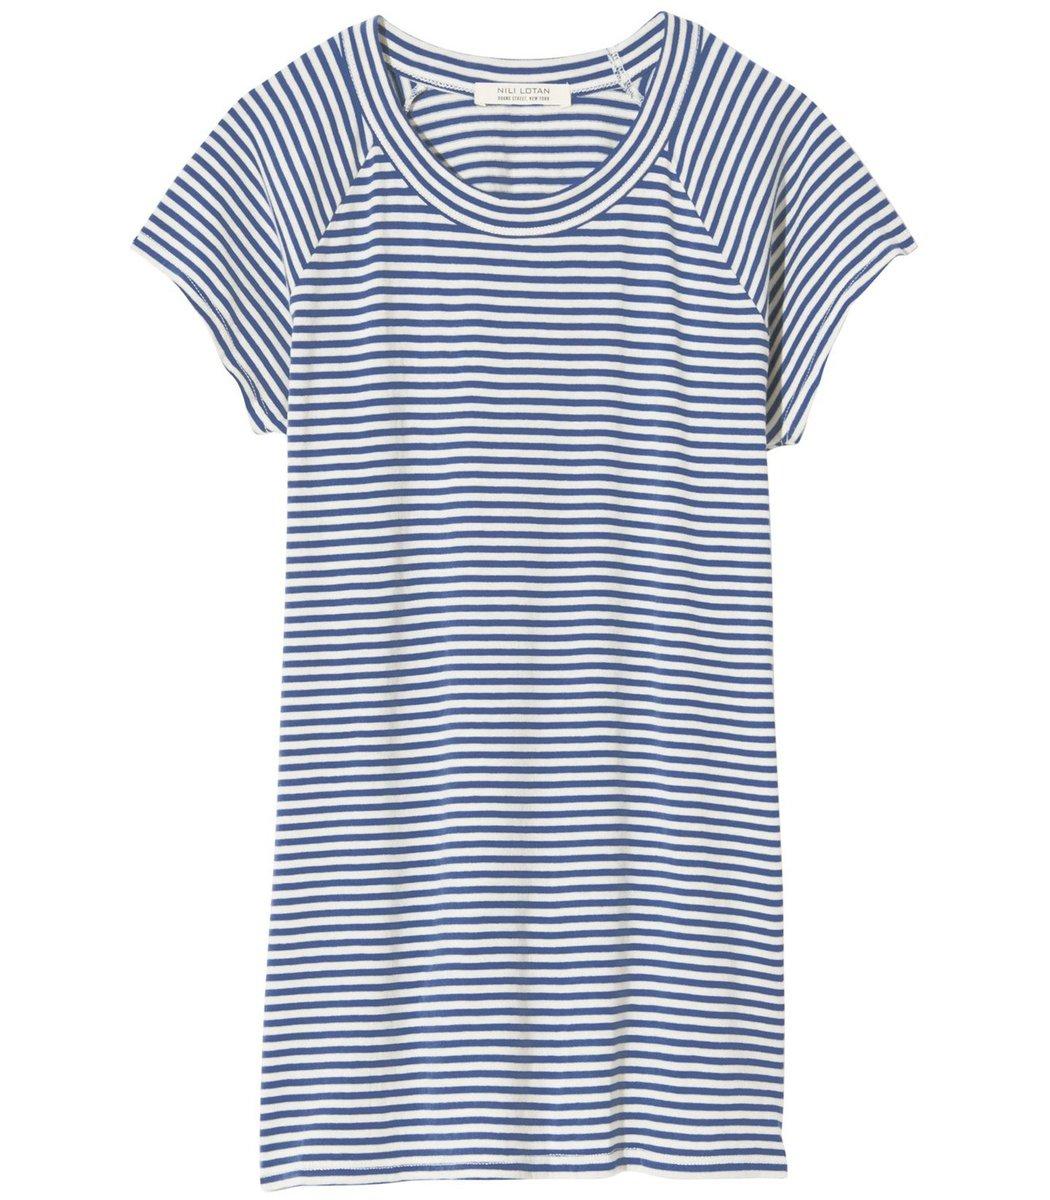 Nili Lotan Short Sleeve Baseball Tee in Sailor Blue/White Stripe